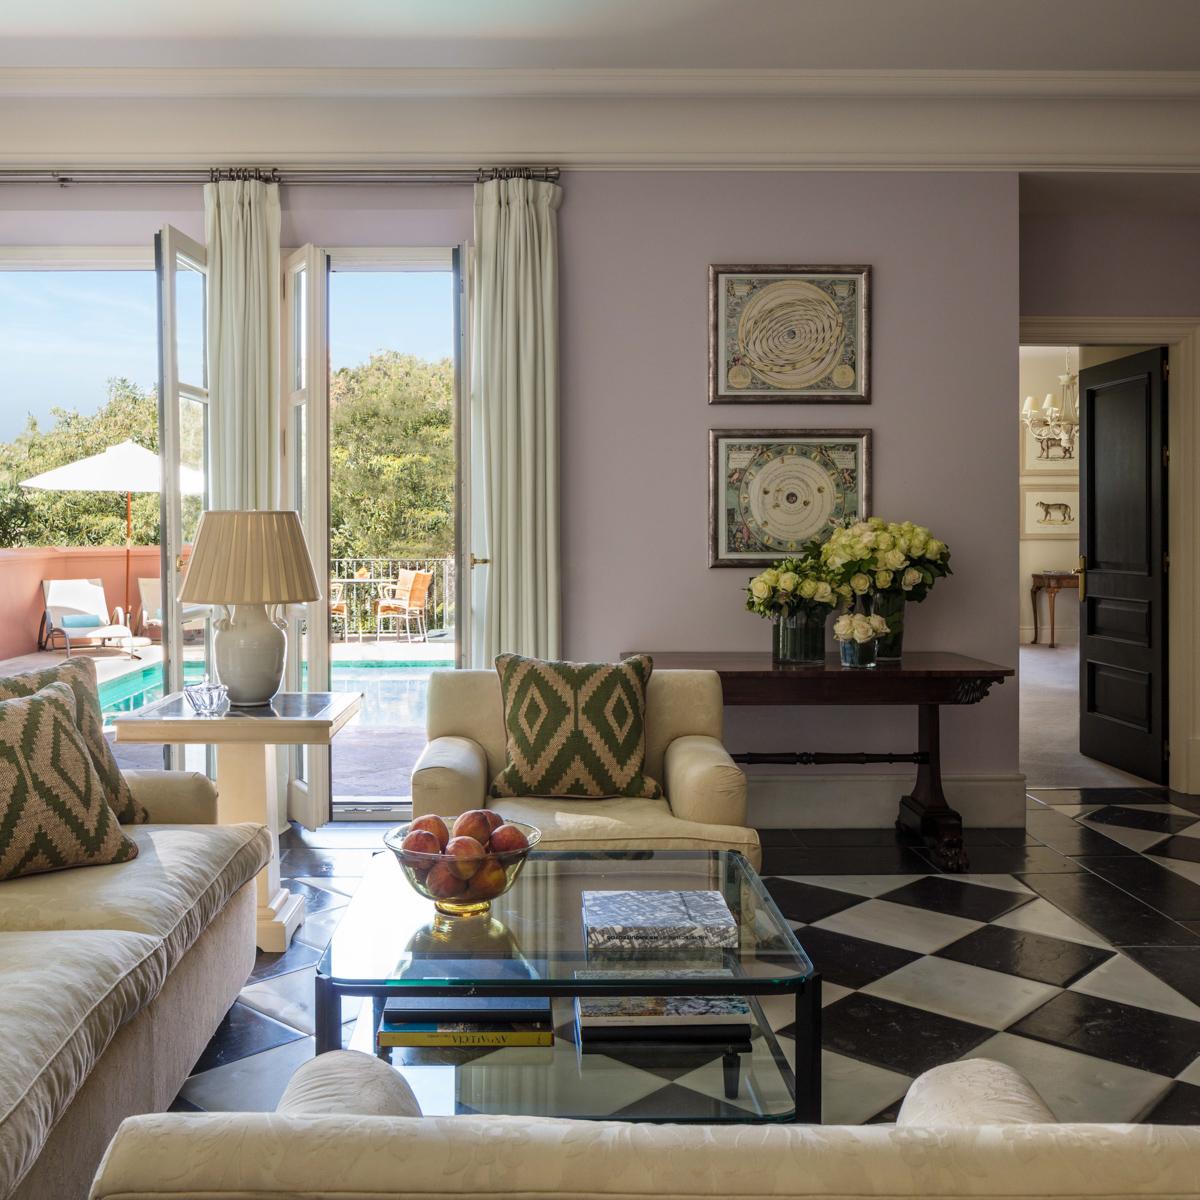 Anantara Luxus Hotel in Marbella-10